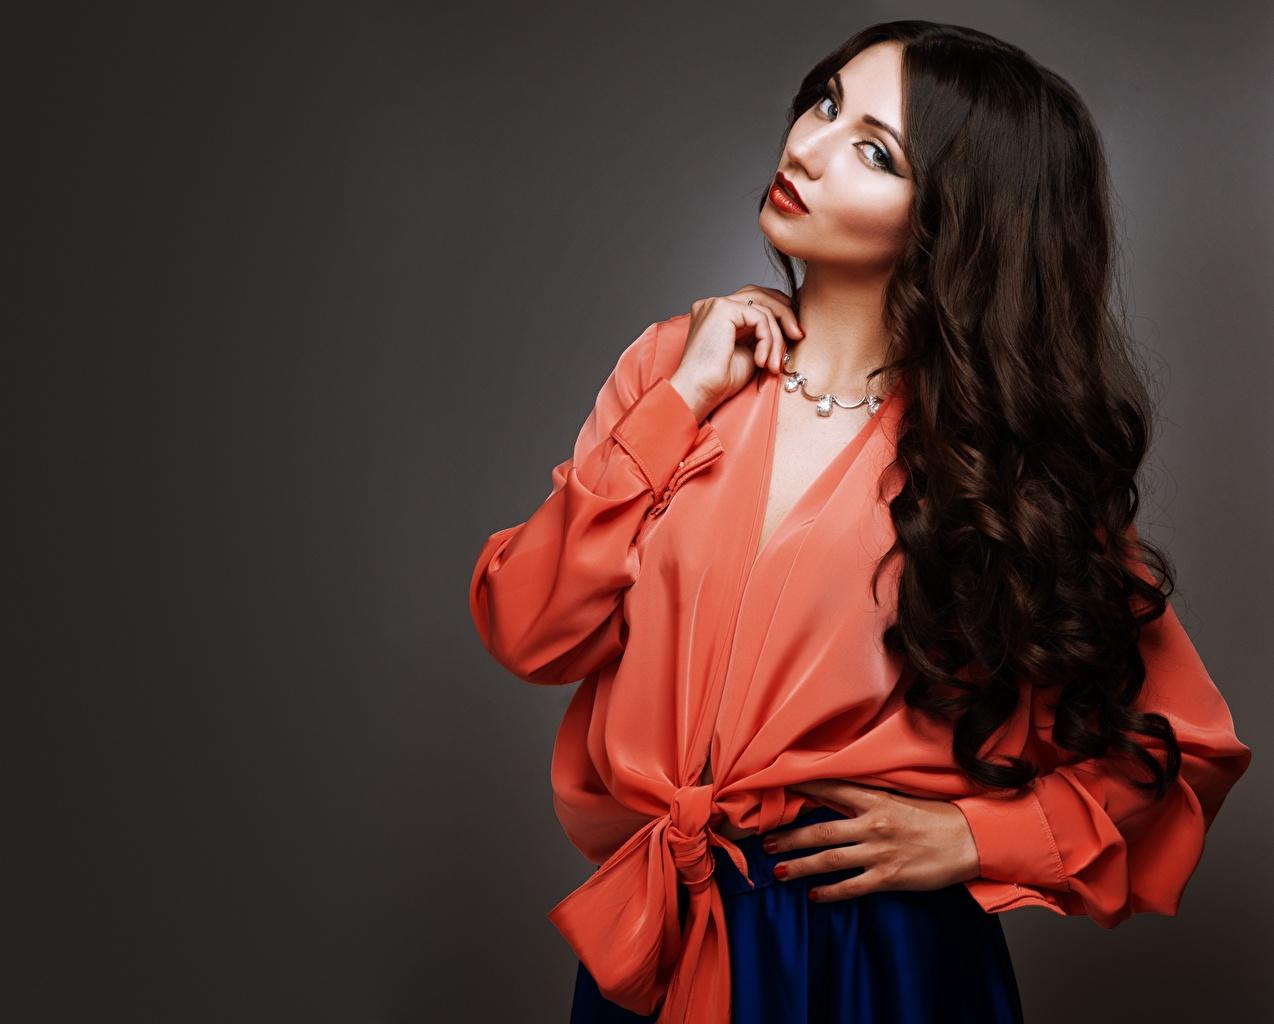 Bilder von Brünette Model Make Up Bluse Haar Mädchens Hand Blick Schminke junge frau junge Frauen Starren